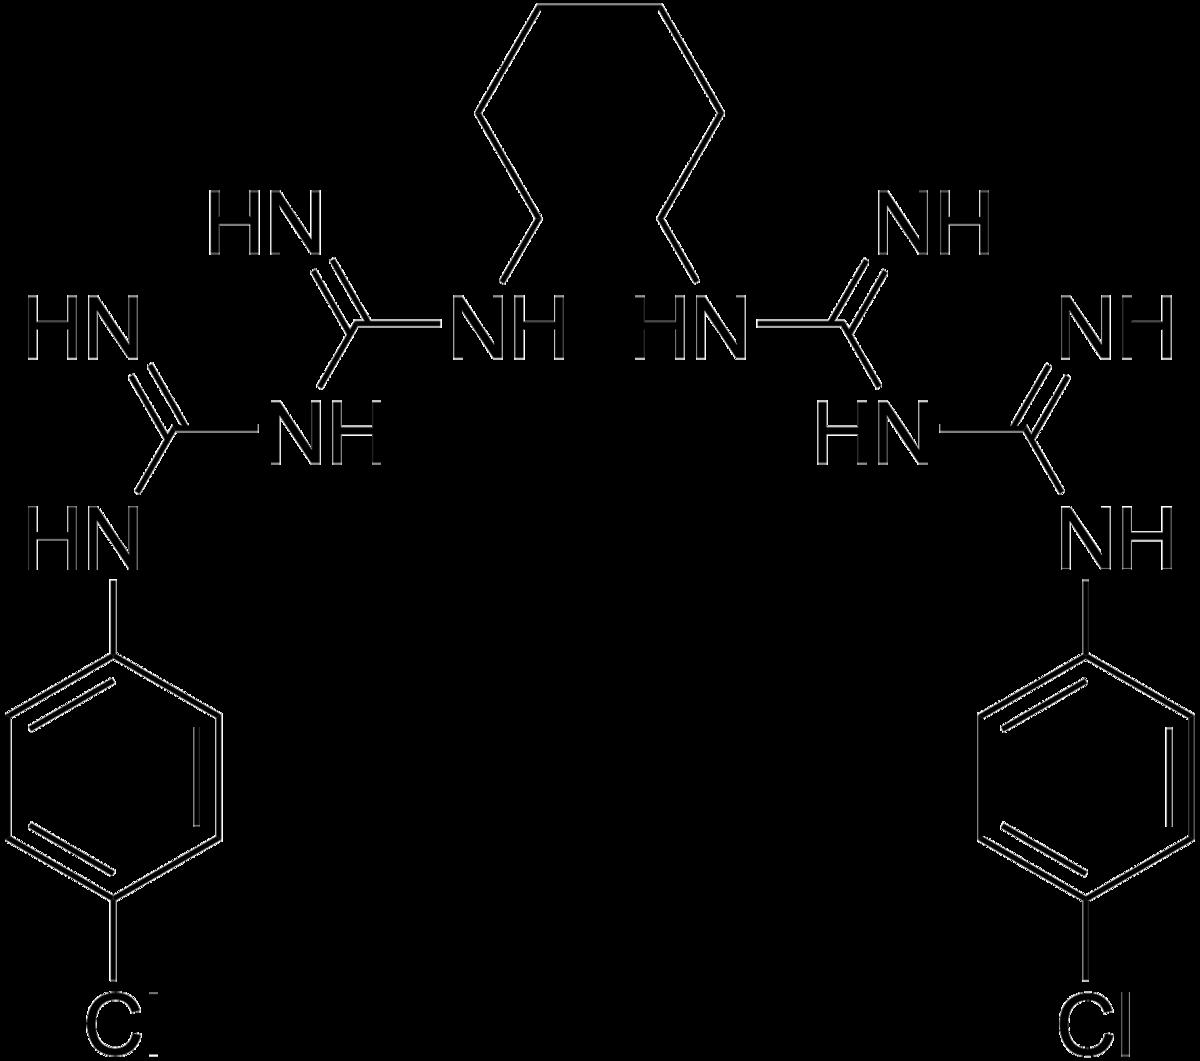 Хлоргексидин убивает кишечную палочку thumbnail